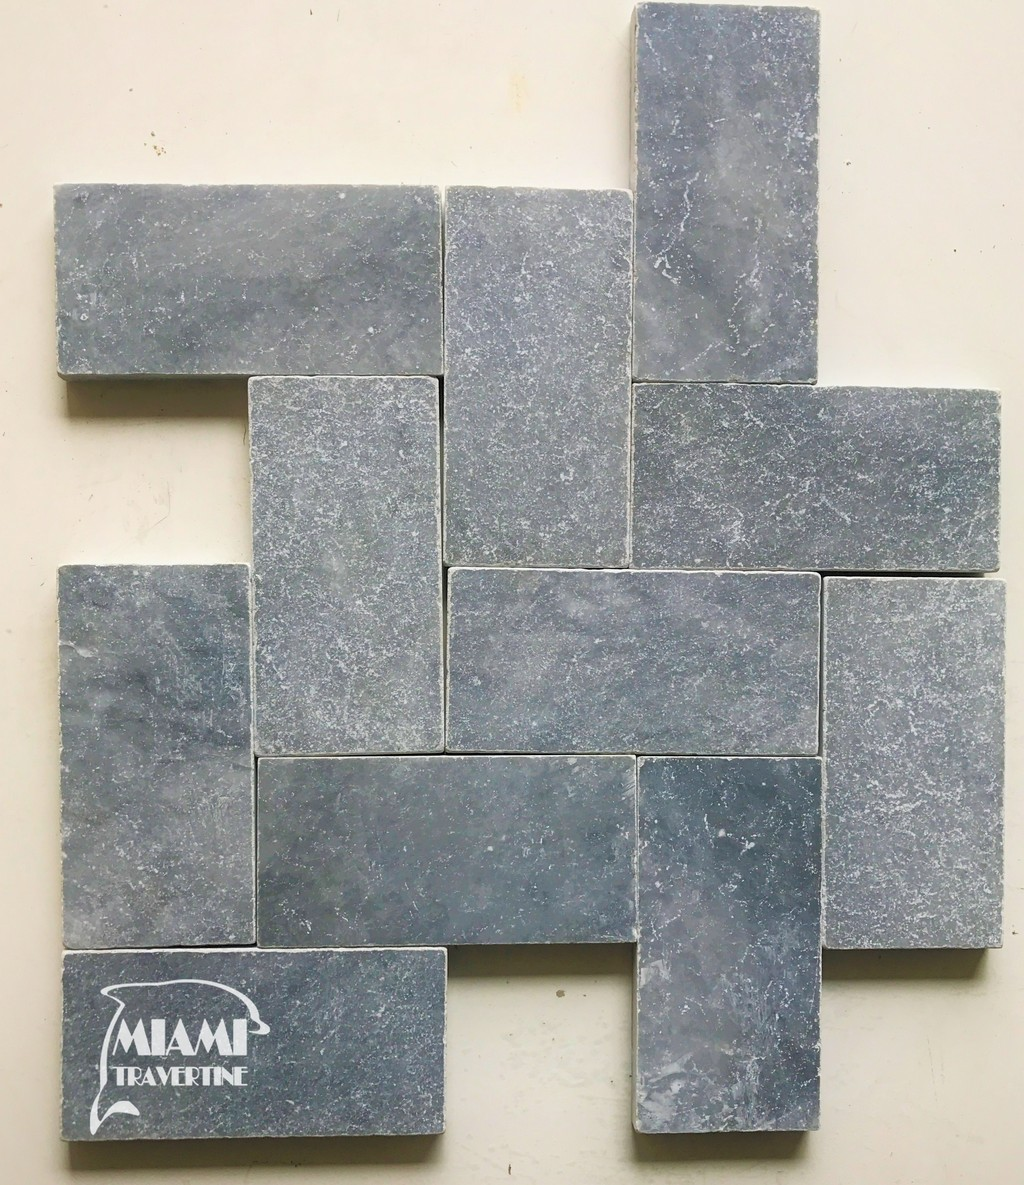 blue sky marble paver 6x12 miami